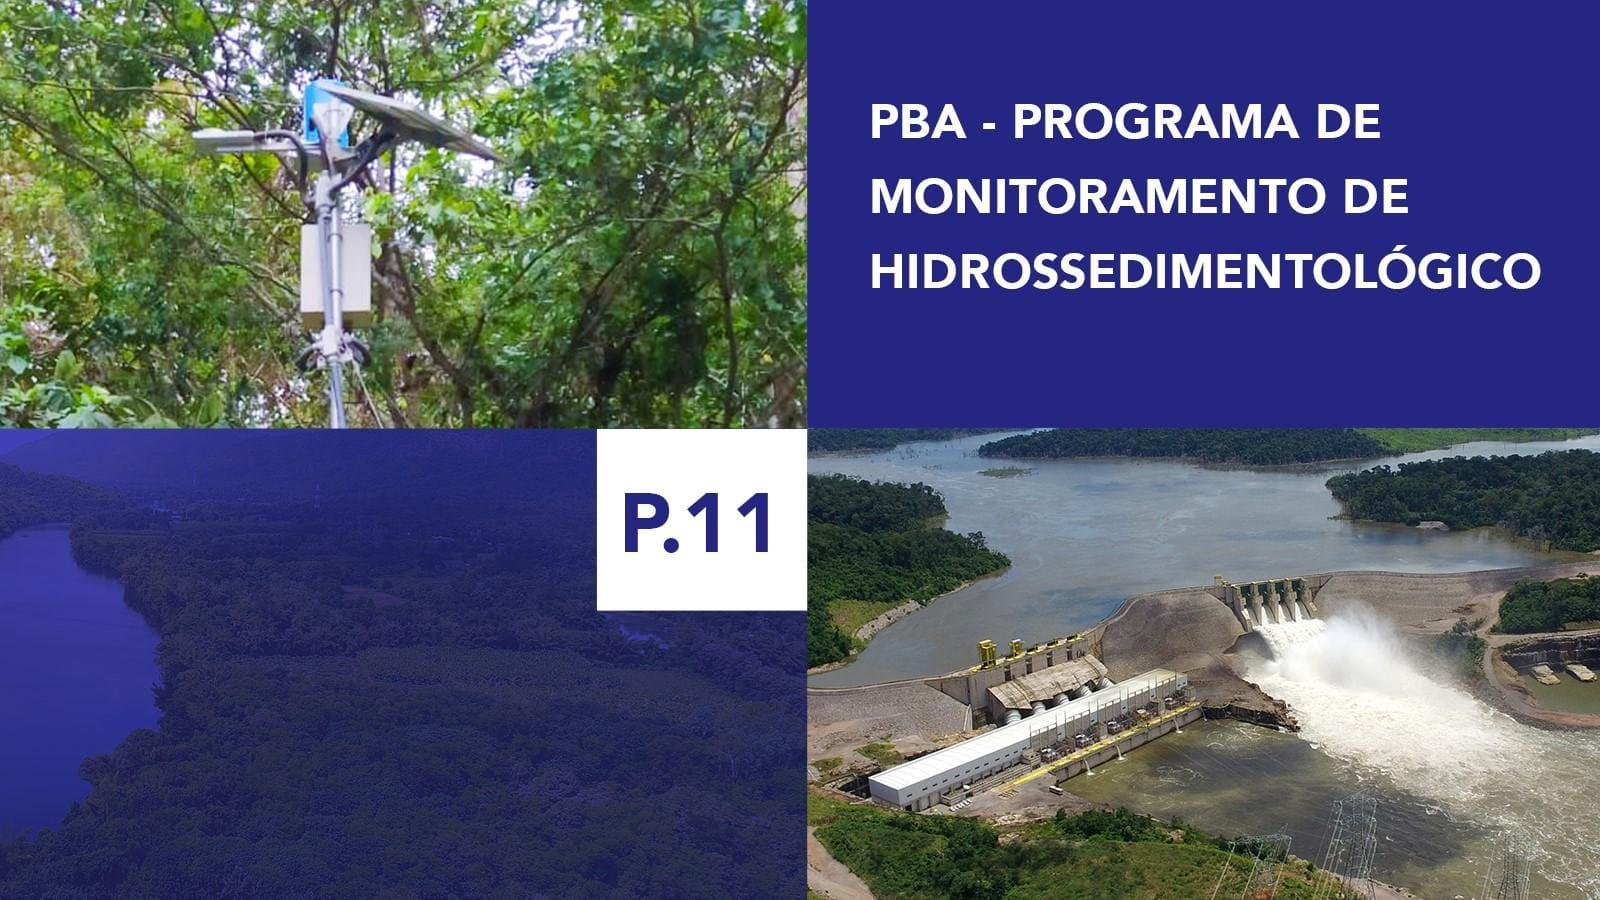 P.11 - Programa de Monitoramento Hidrossedimentológico